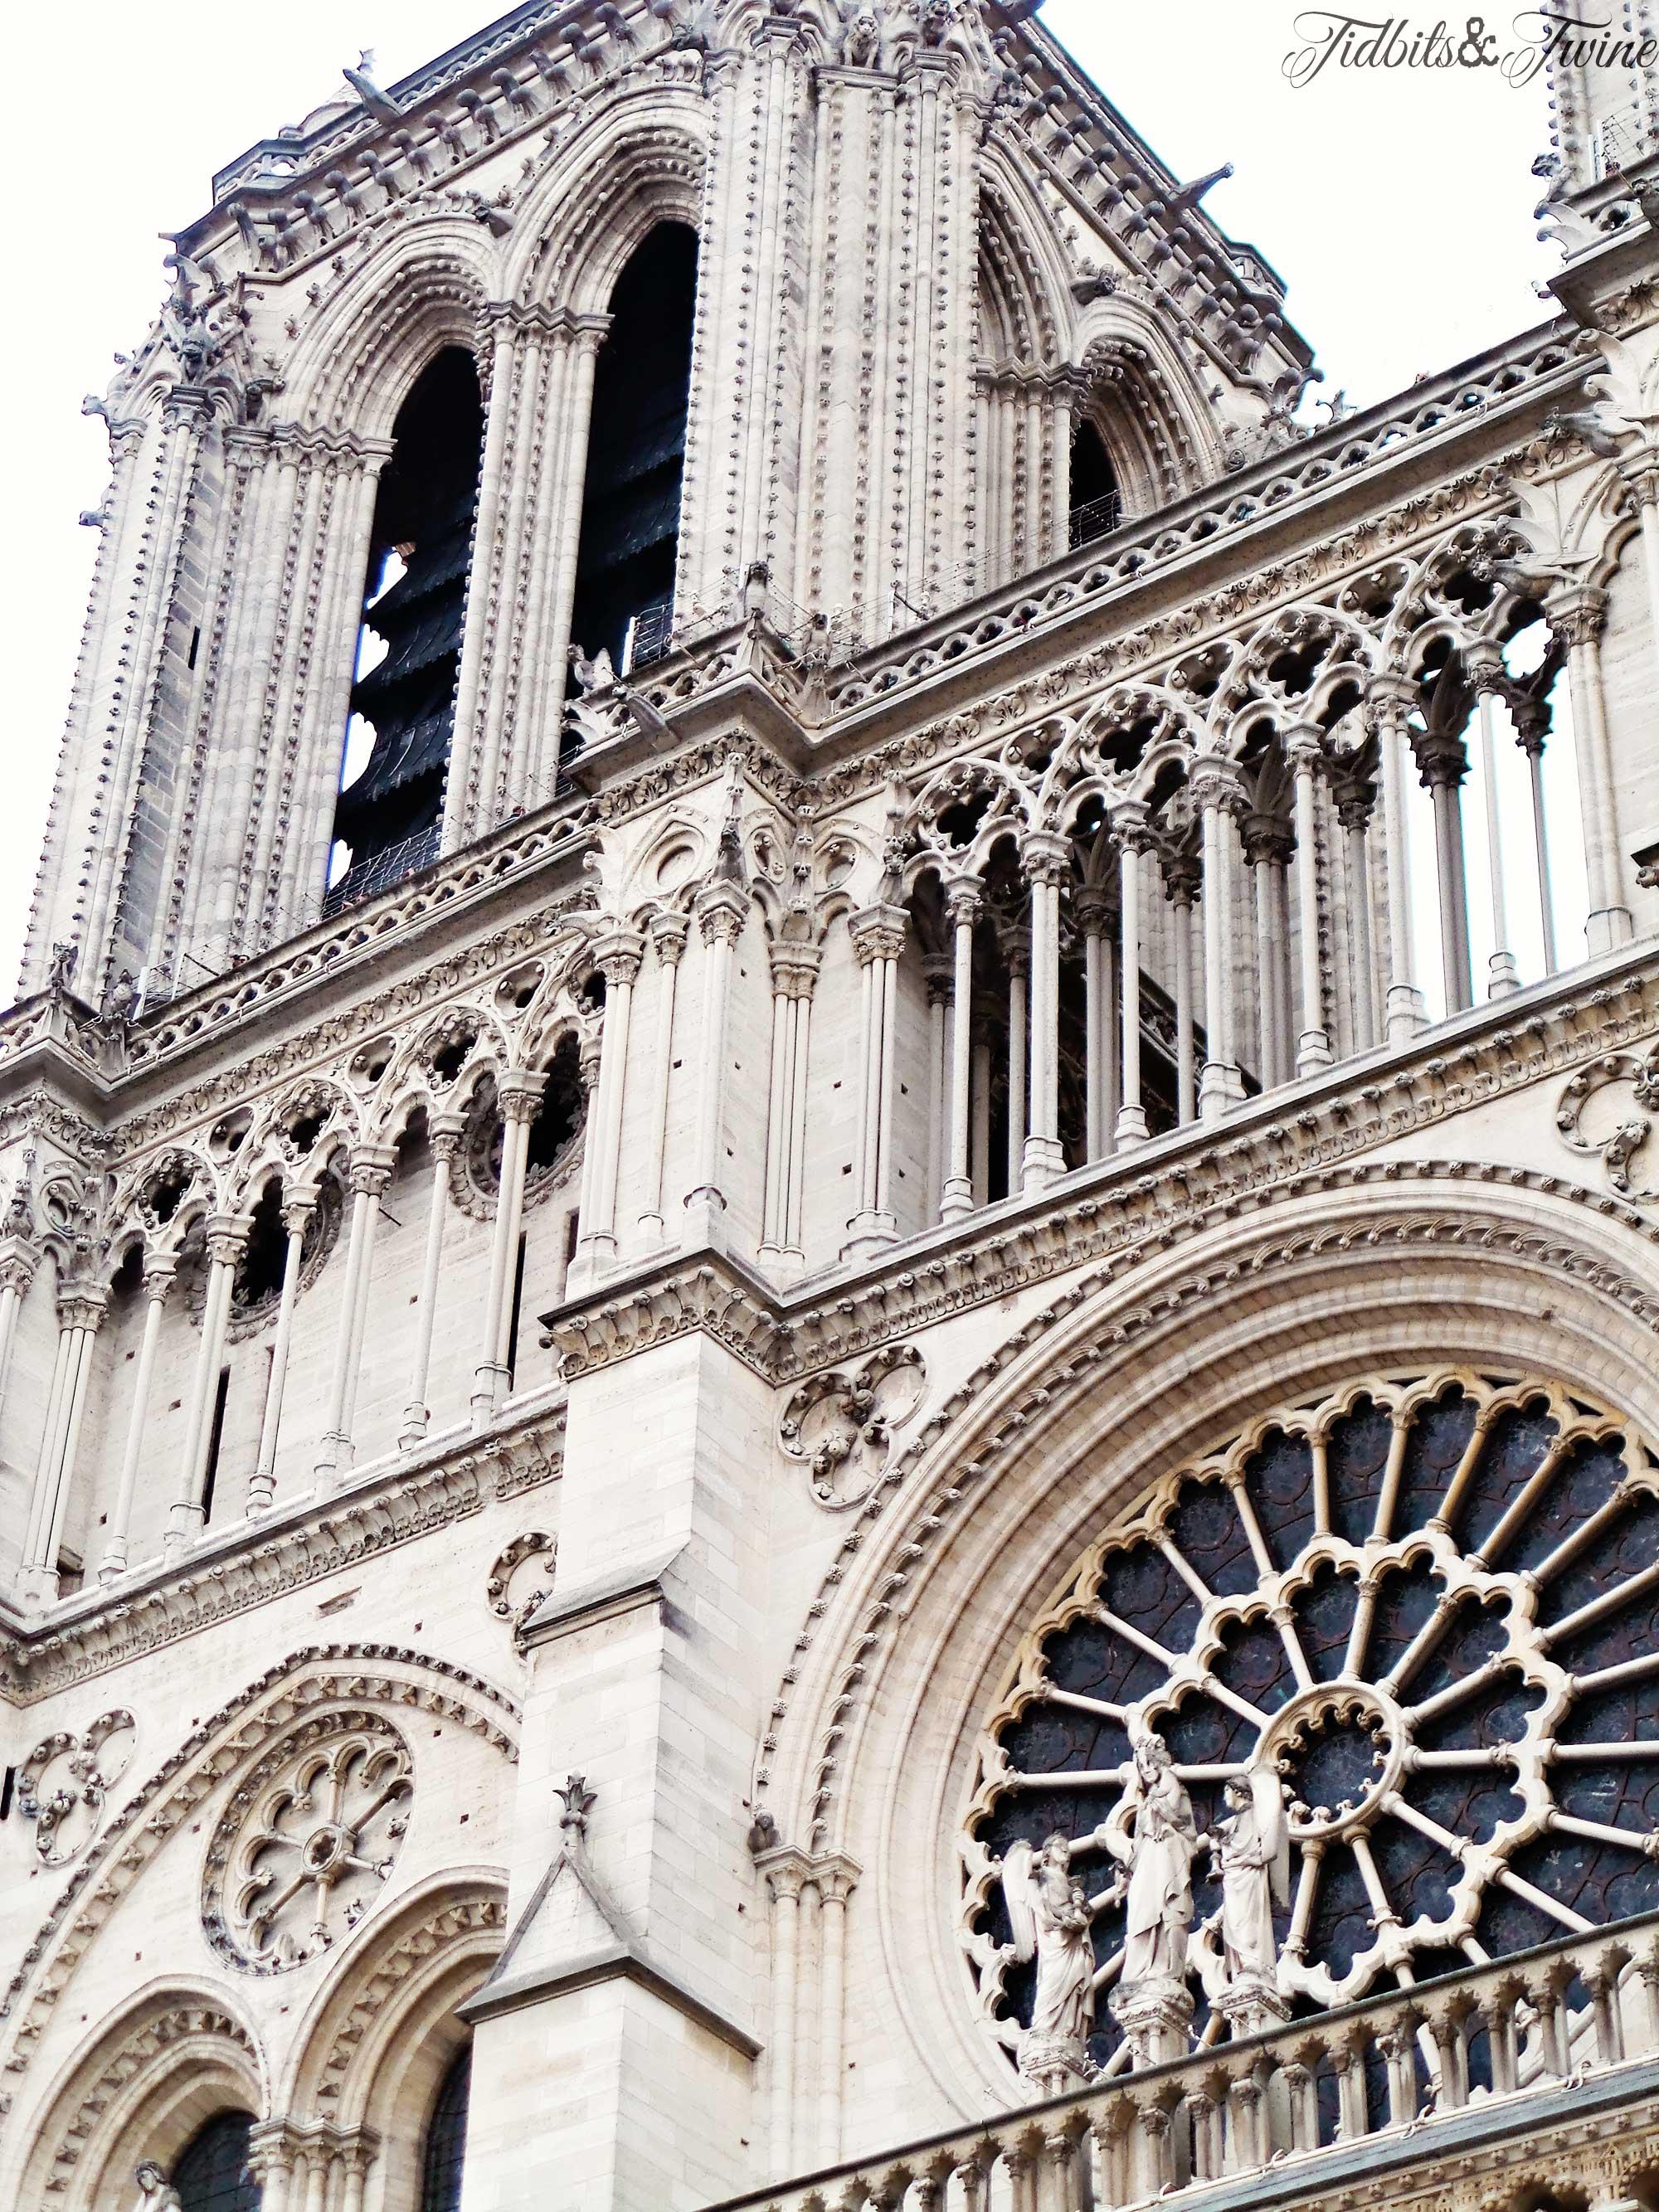 TIDBITS&TWINE-Notre Dame Spring 2015